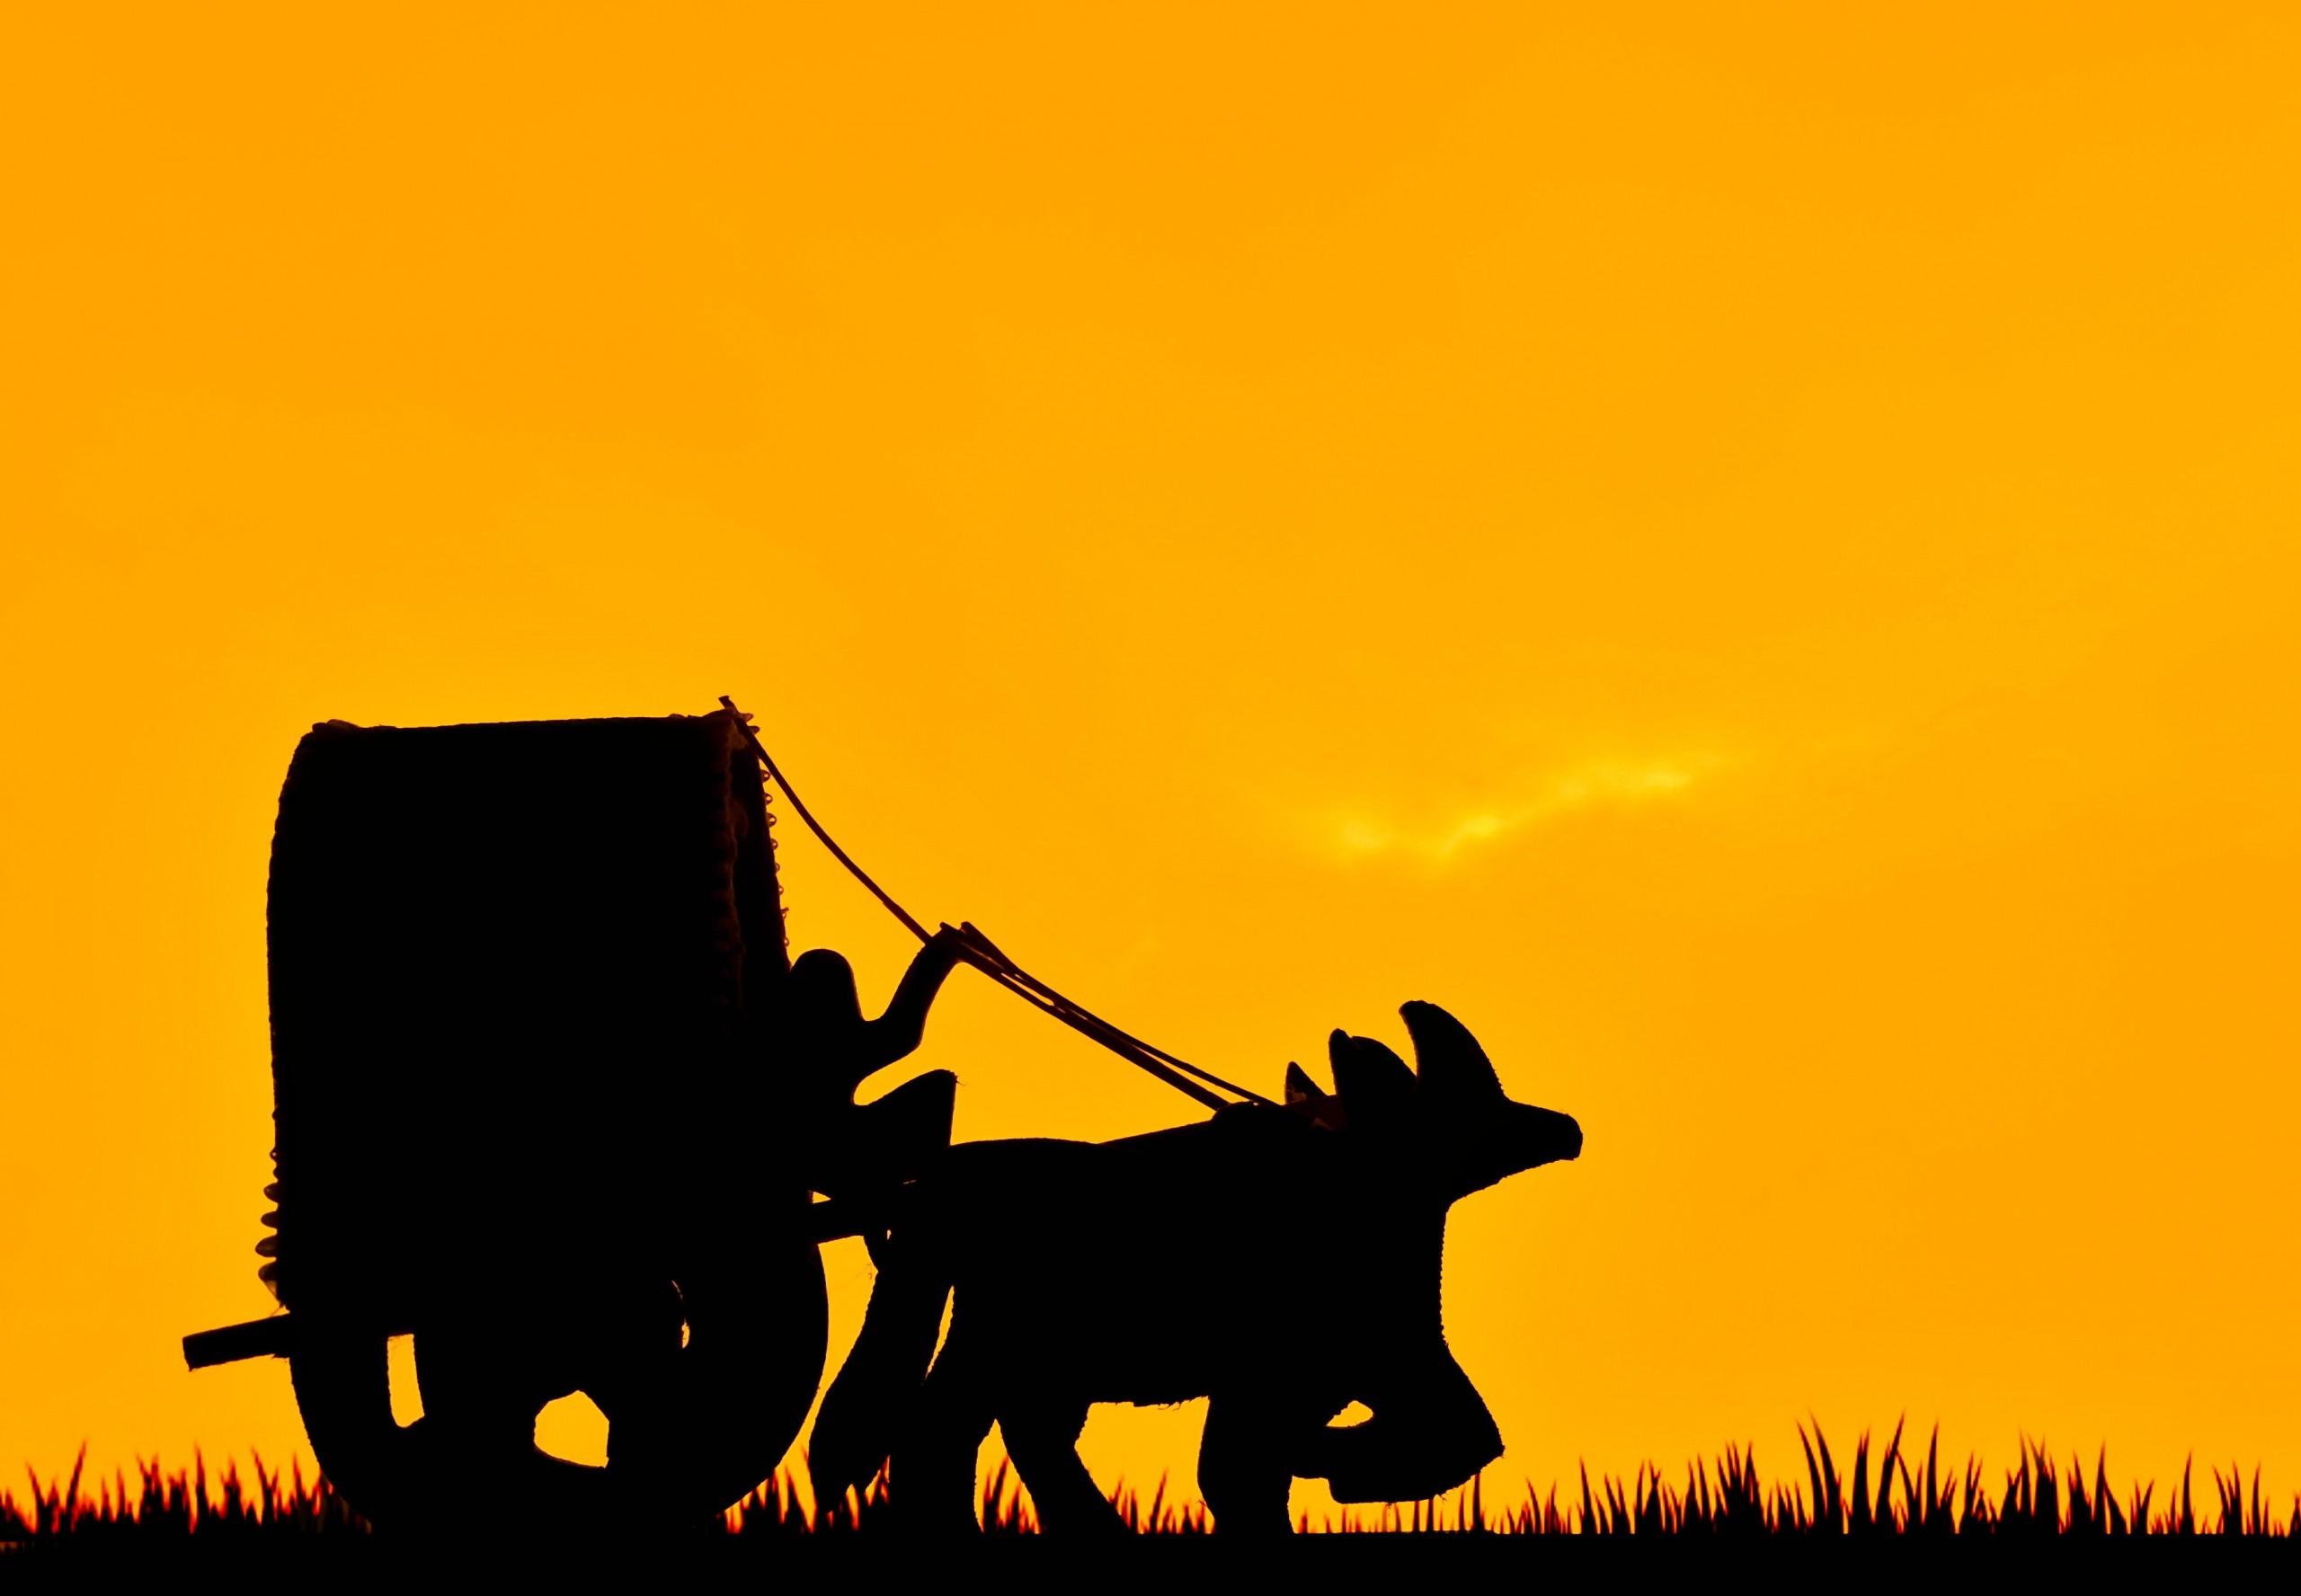 Bullock cart silhouette